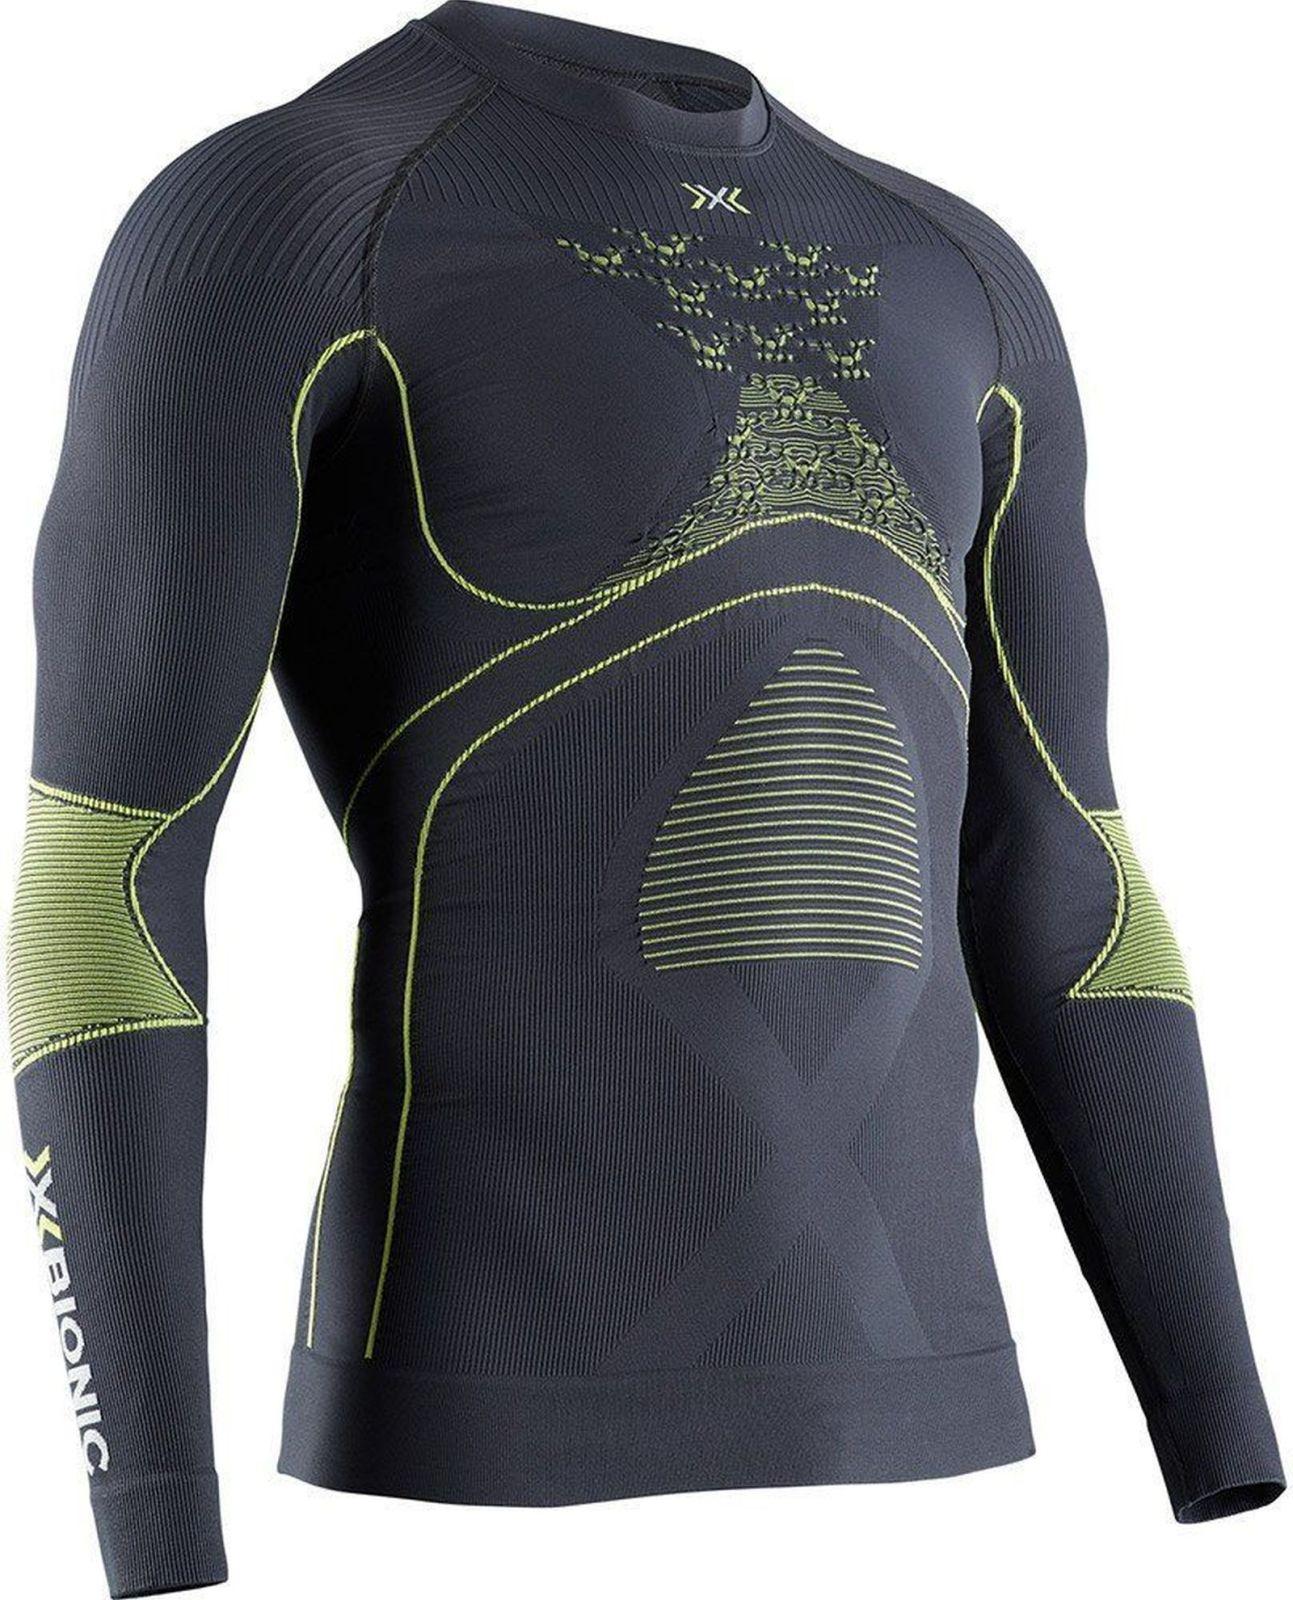 X-Bionic - tričko T Energy Accumulator 4.0 shirt round neck LG SL charcoal/yellow Velikost: XL